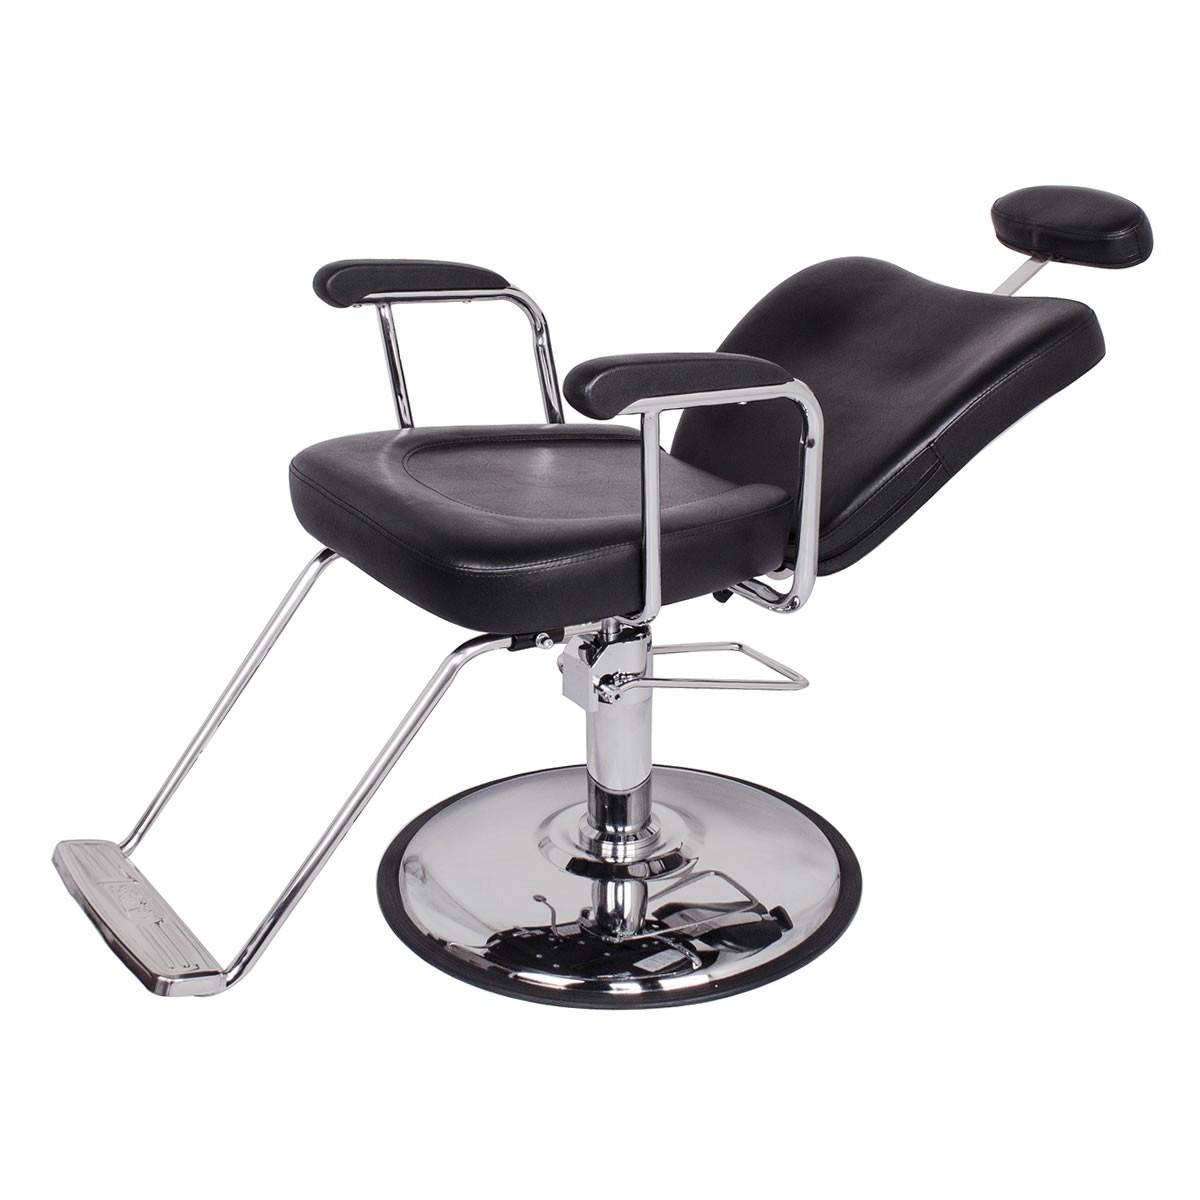 """DALLAS"" Reclining All-Purpose Salon Chair (Free Shipping)"